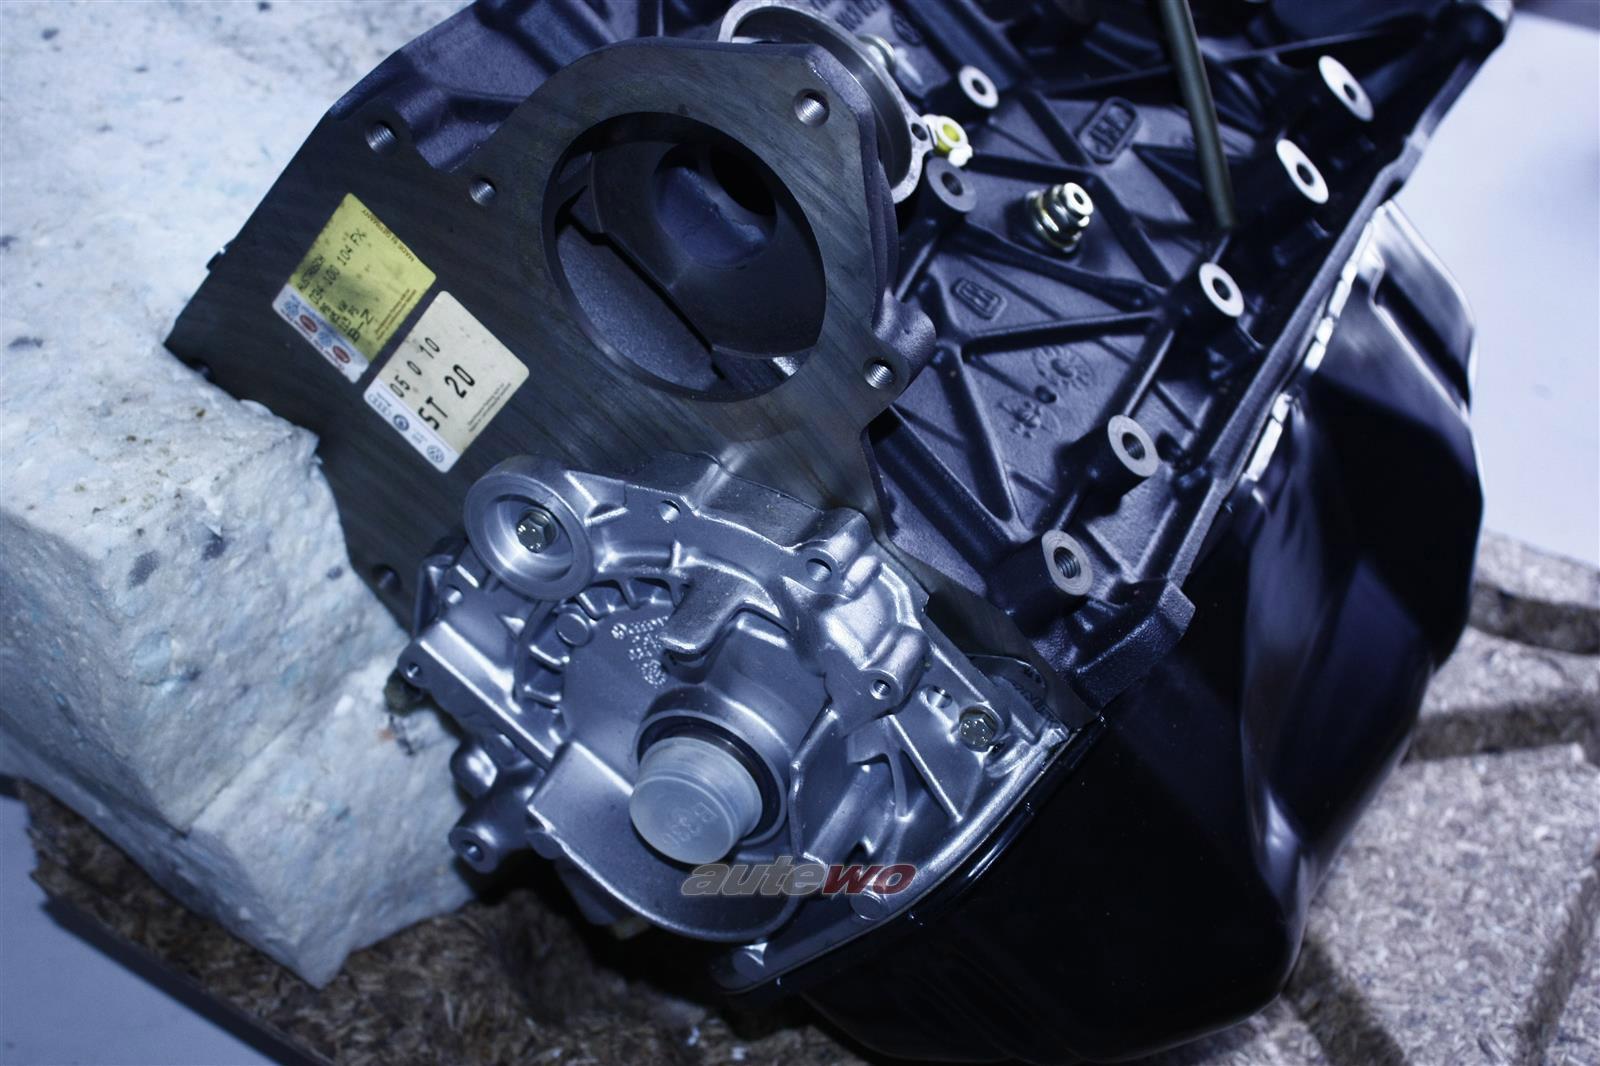 034100104FX NEU Audi 90 Typ 89/100 Typ 44 2.0l 5 Zyl. Teilmotor/Motorblock